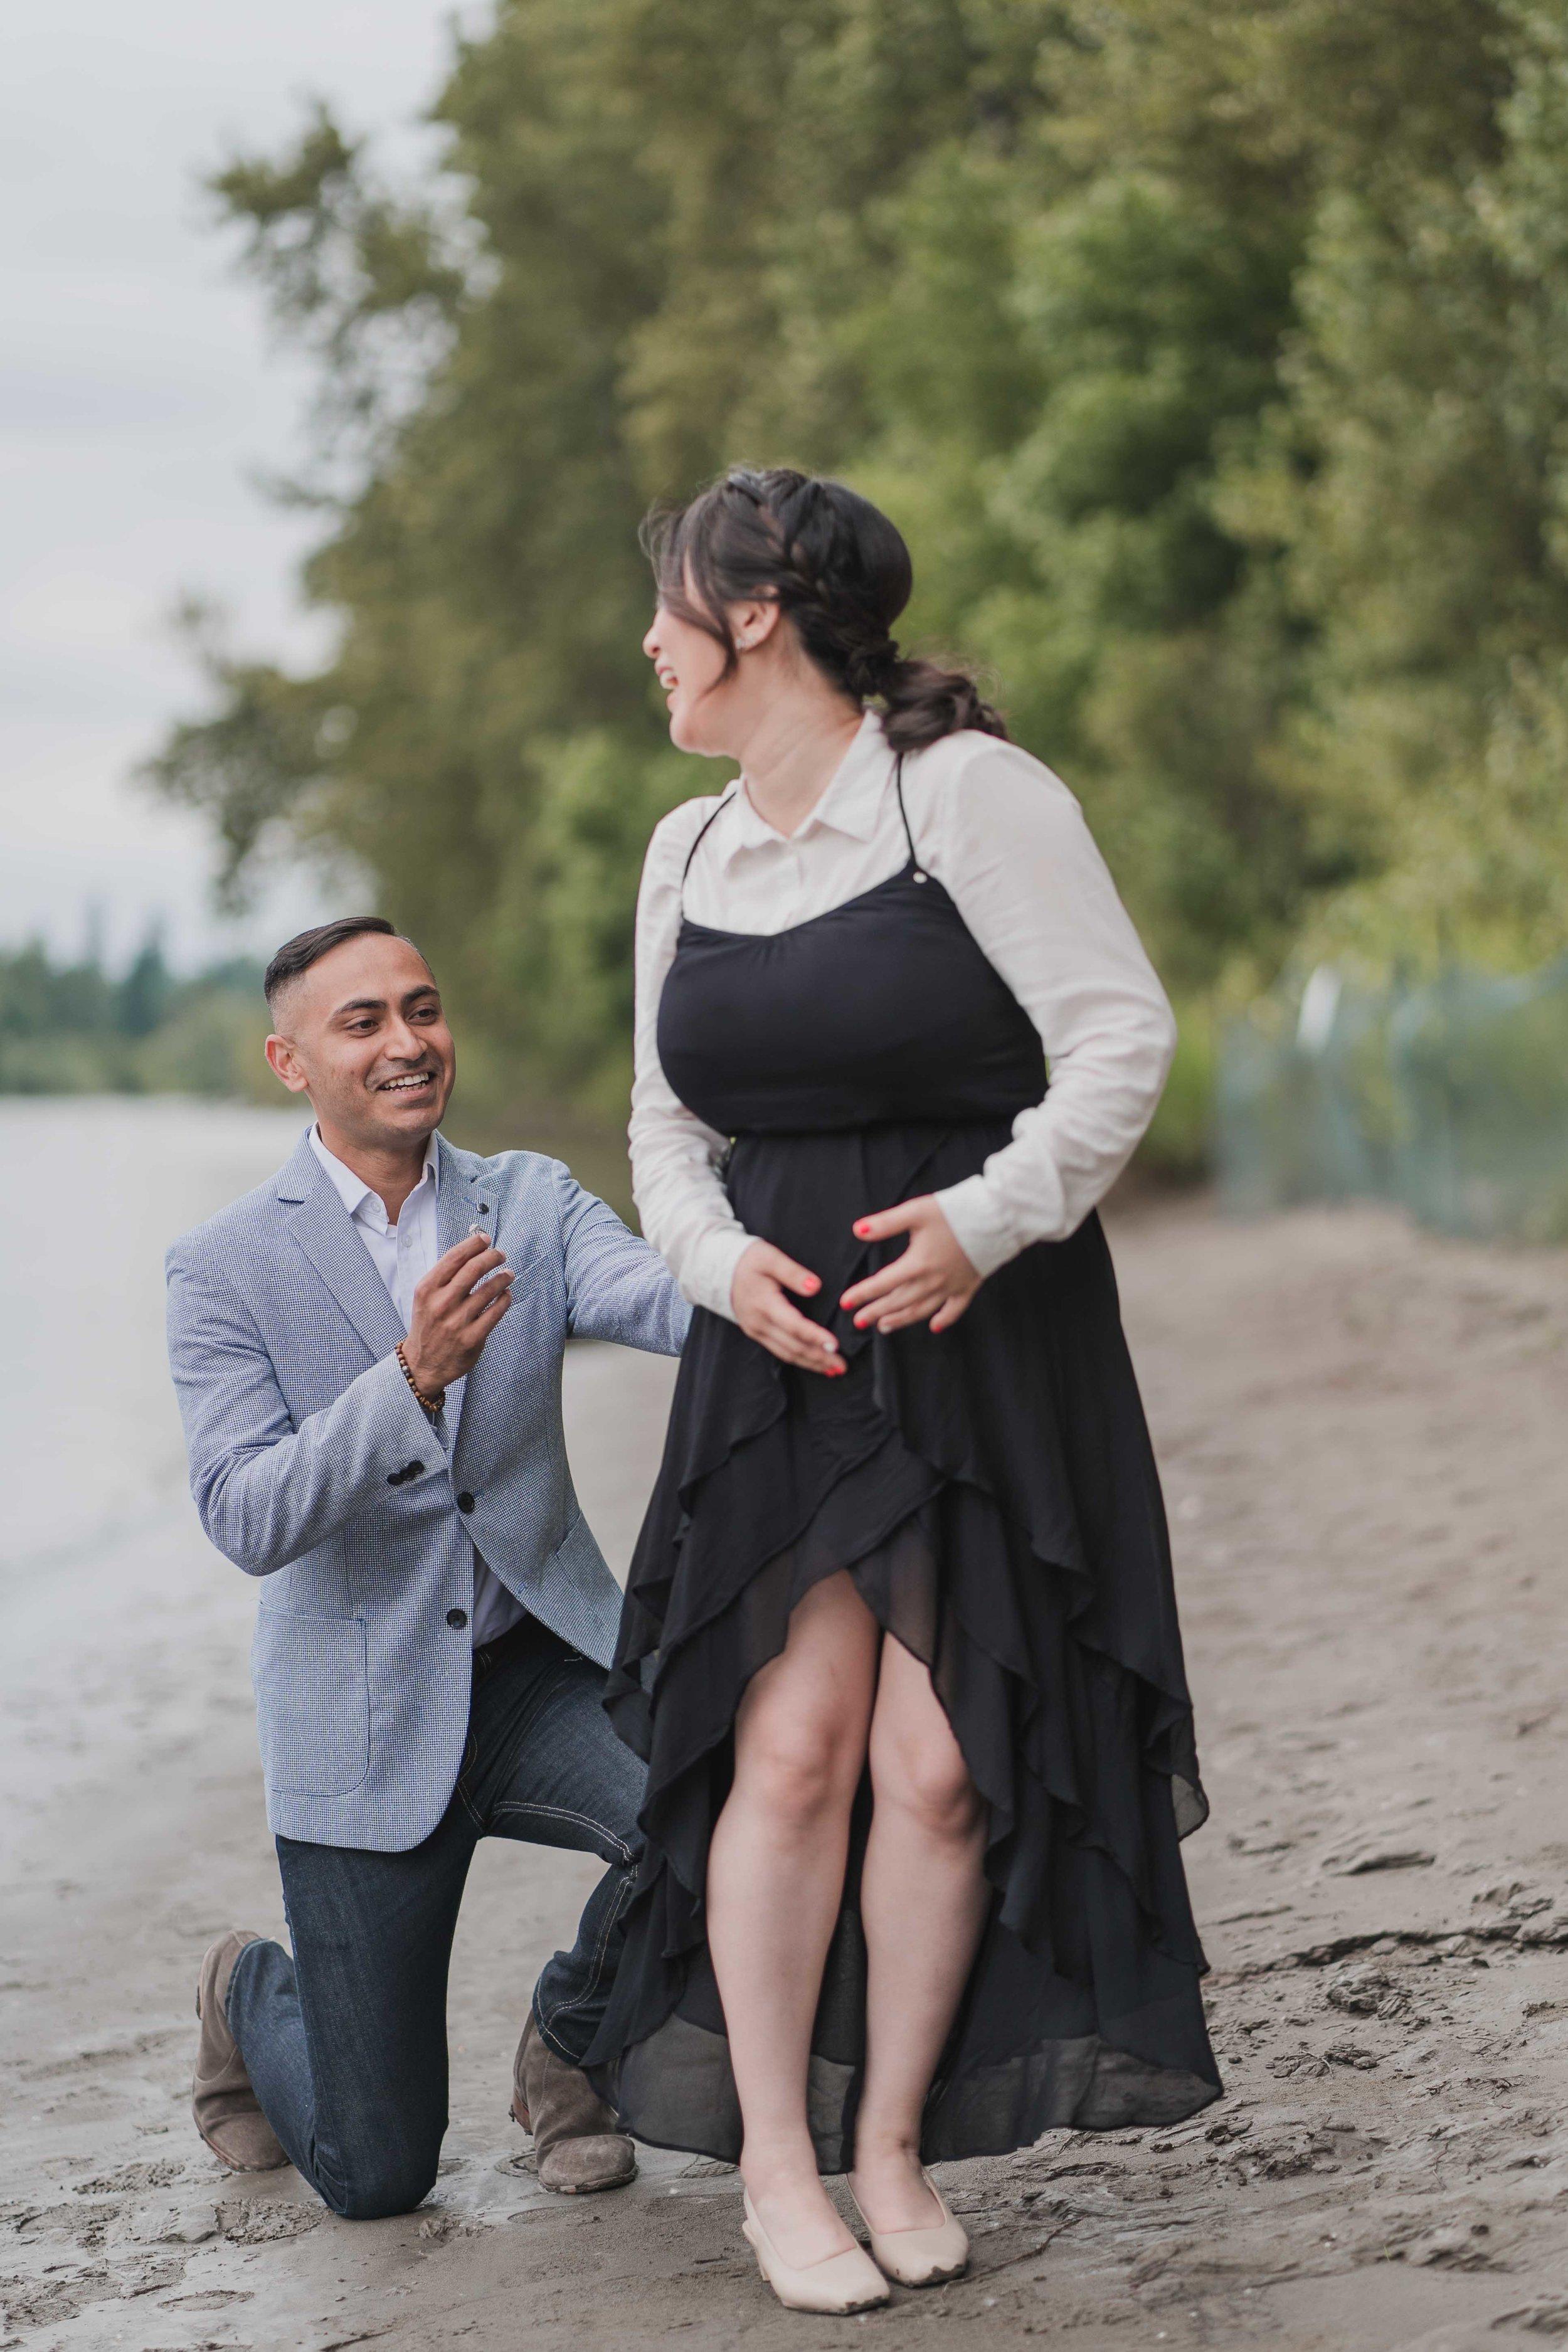 20190622 - Monika & Johnson Engagement - 0133.jpg